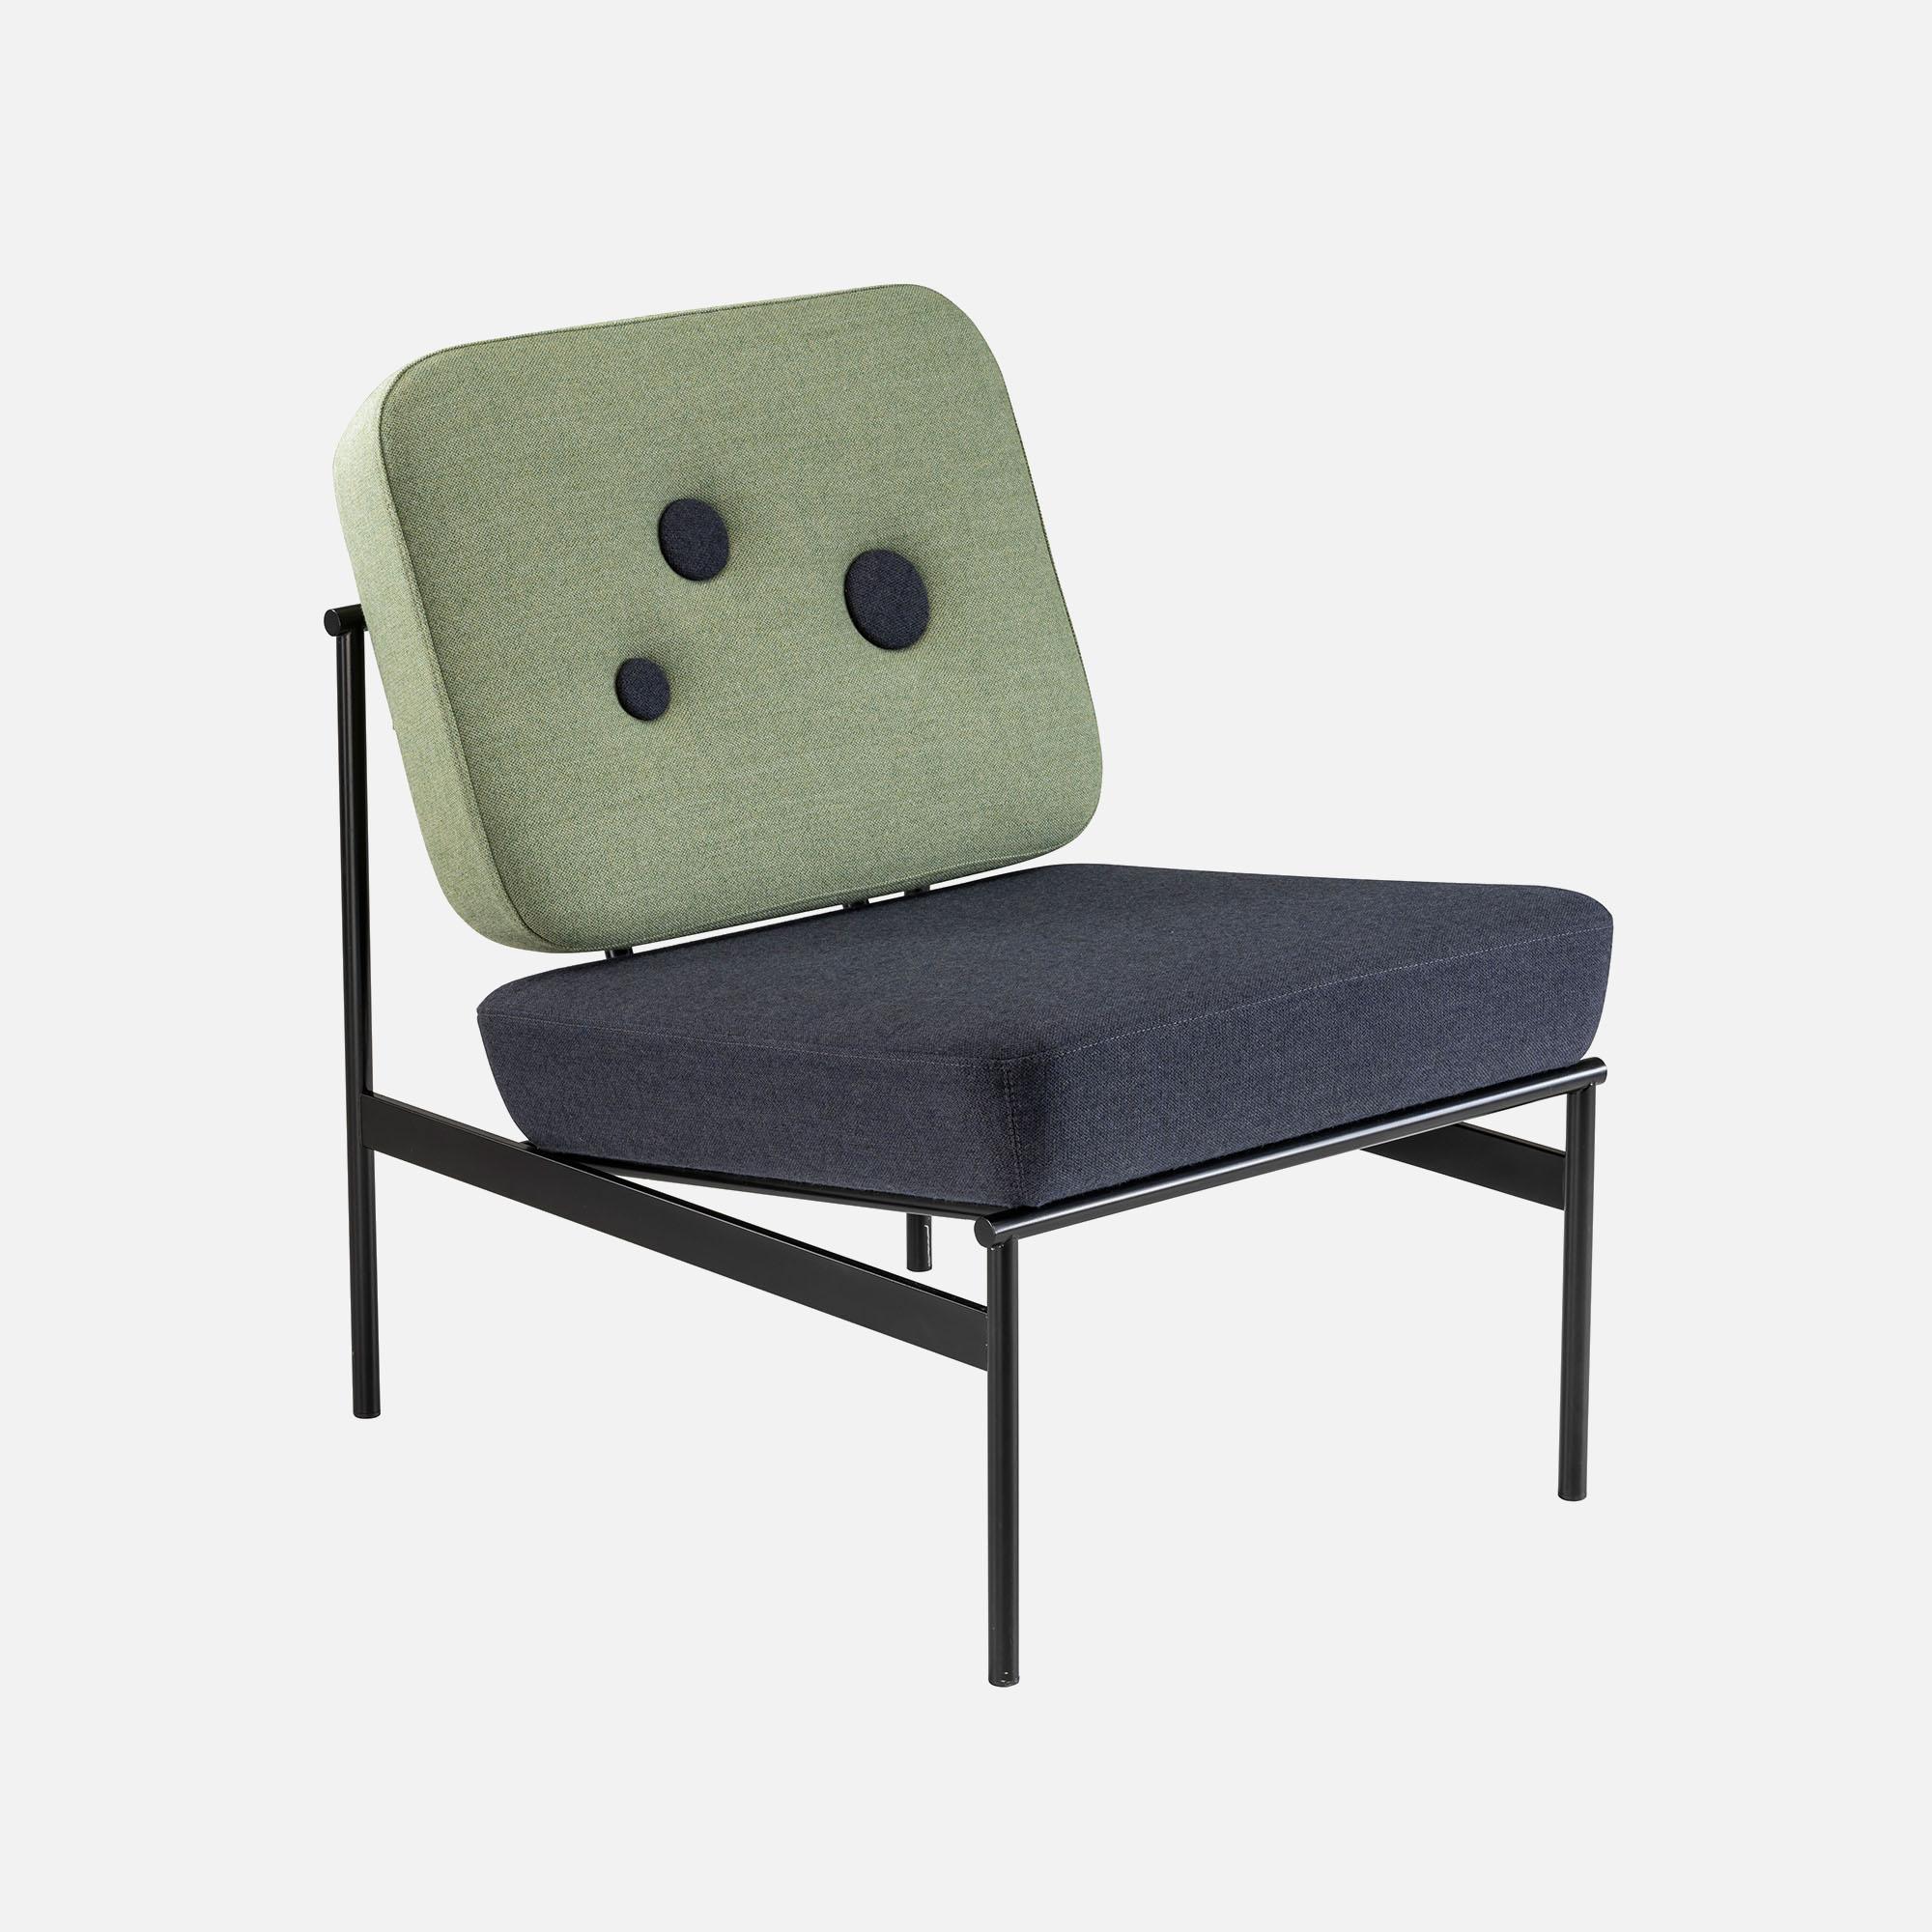 VAD Dapple Lounge Chair.jpg